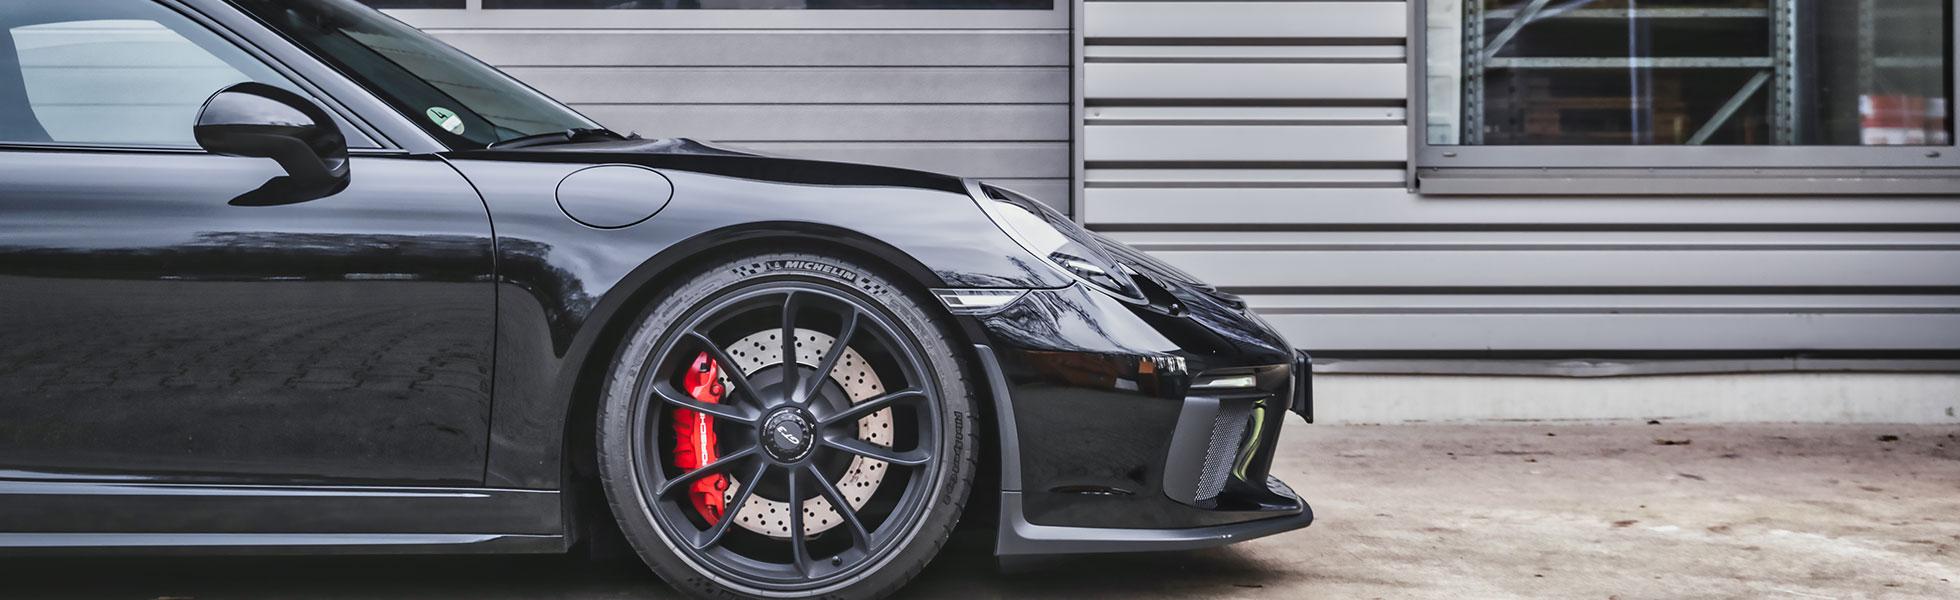 Porsche 911 Buy Rims & Complete Wheels